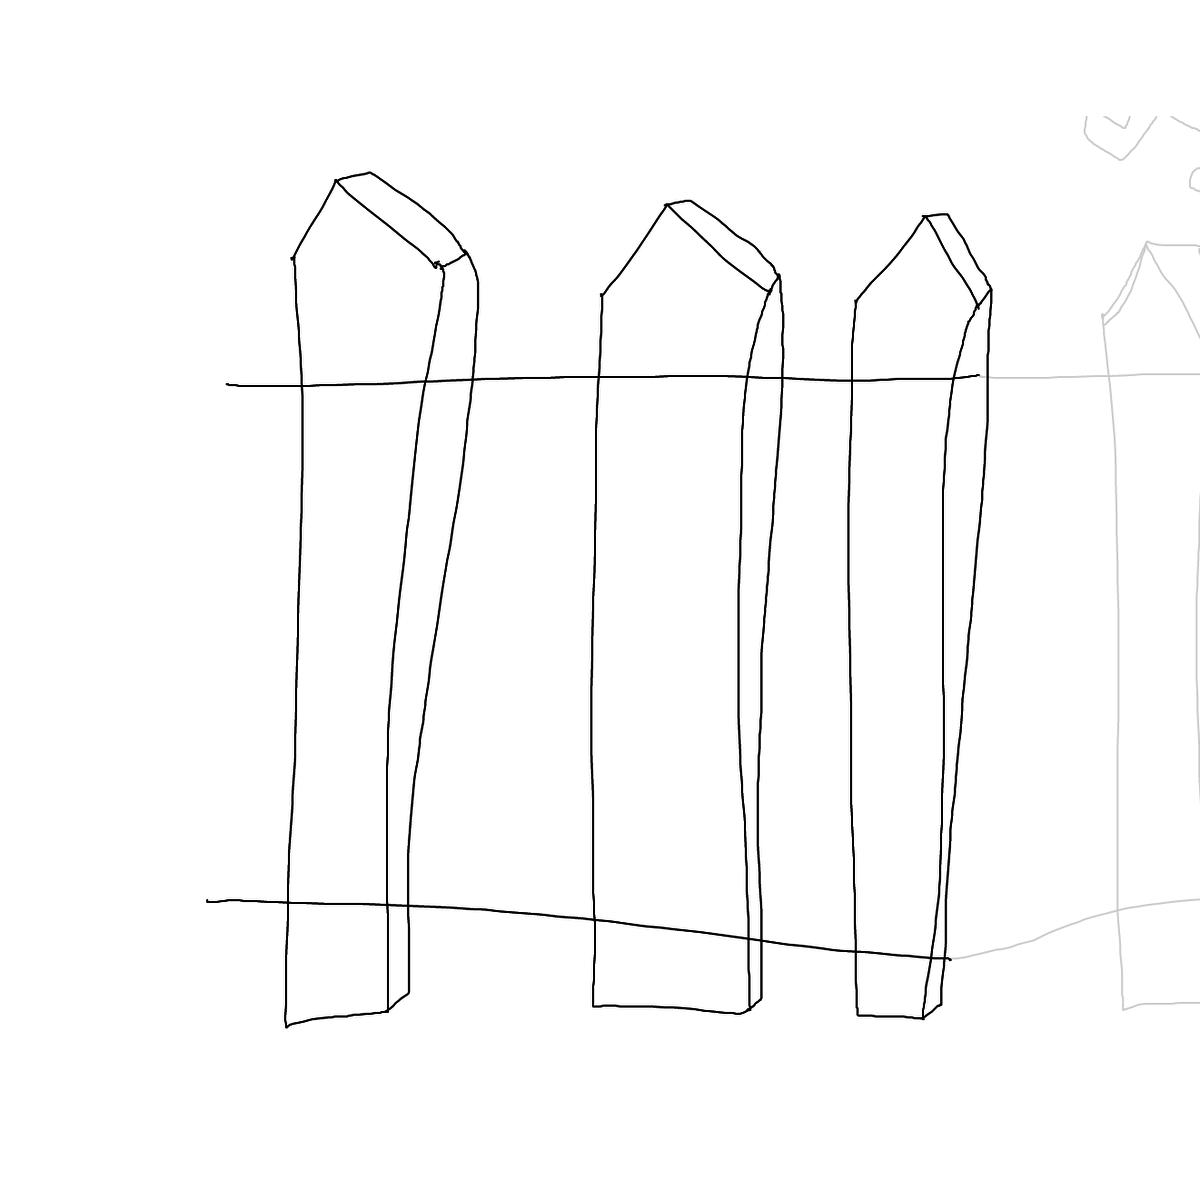 BAAAM drawing#16129 lat:52.4752502441406250lng: 13.4059219360351560